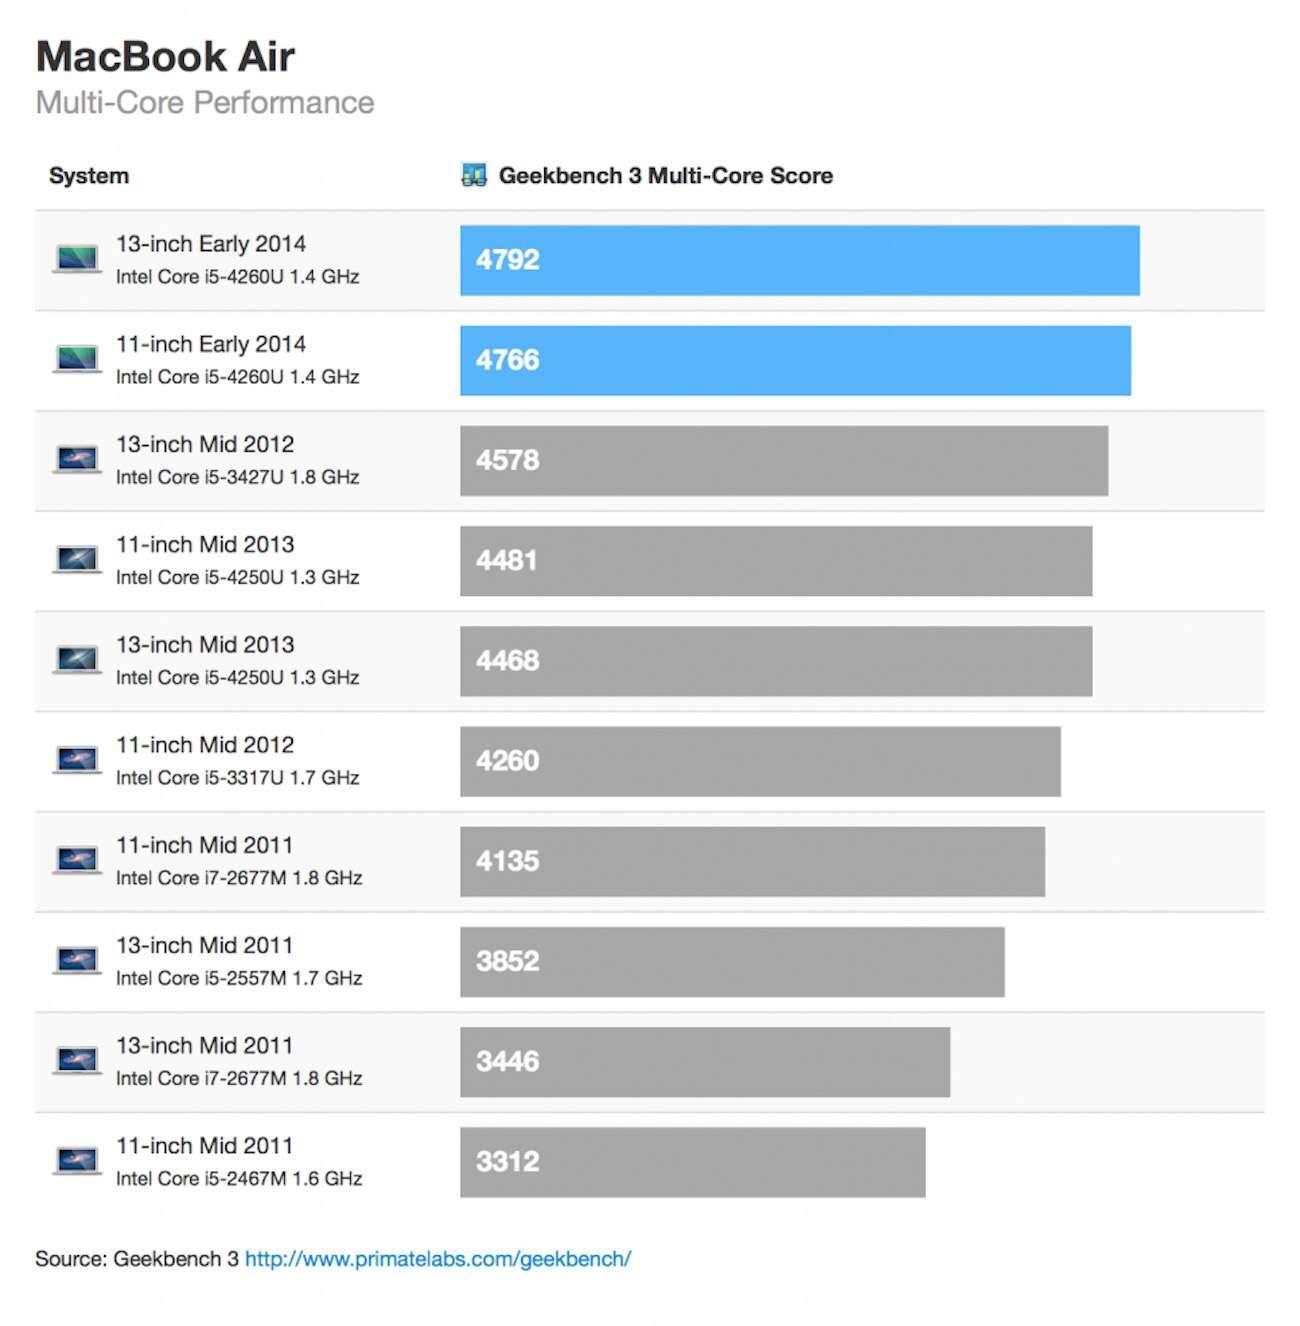 MacBook2.onetech.pl